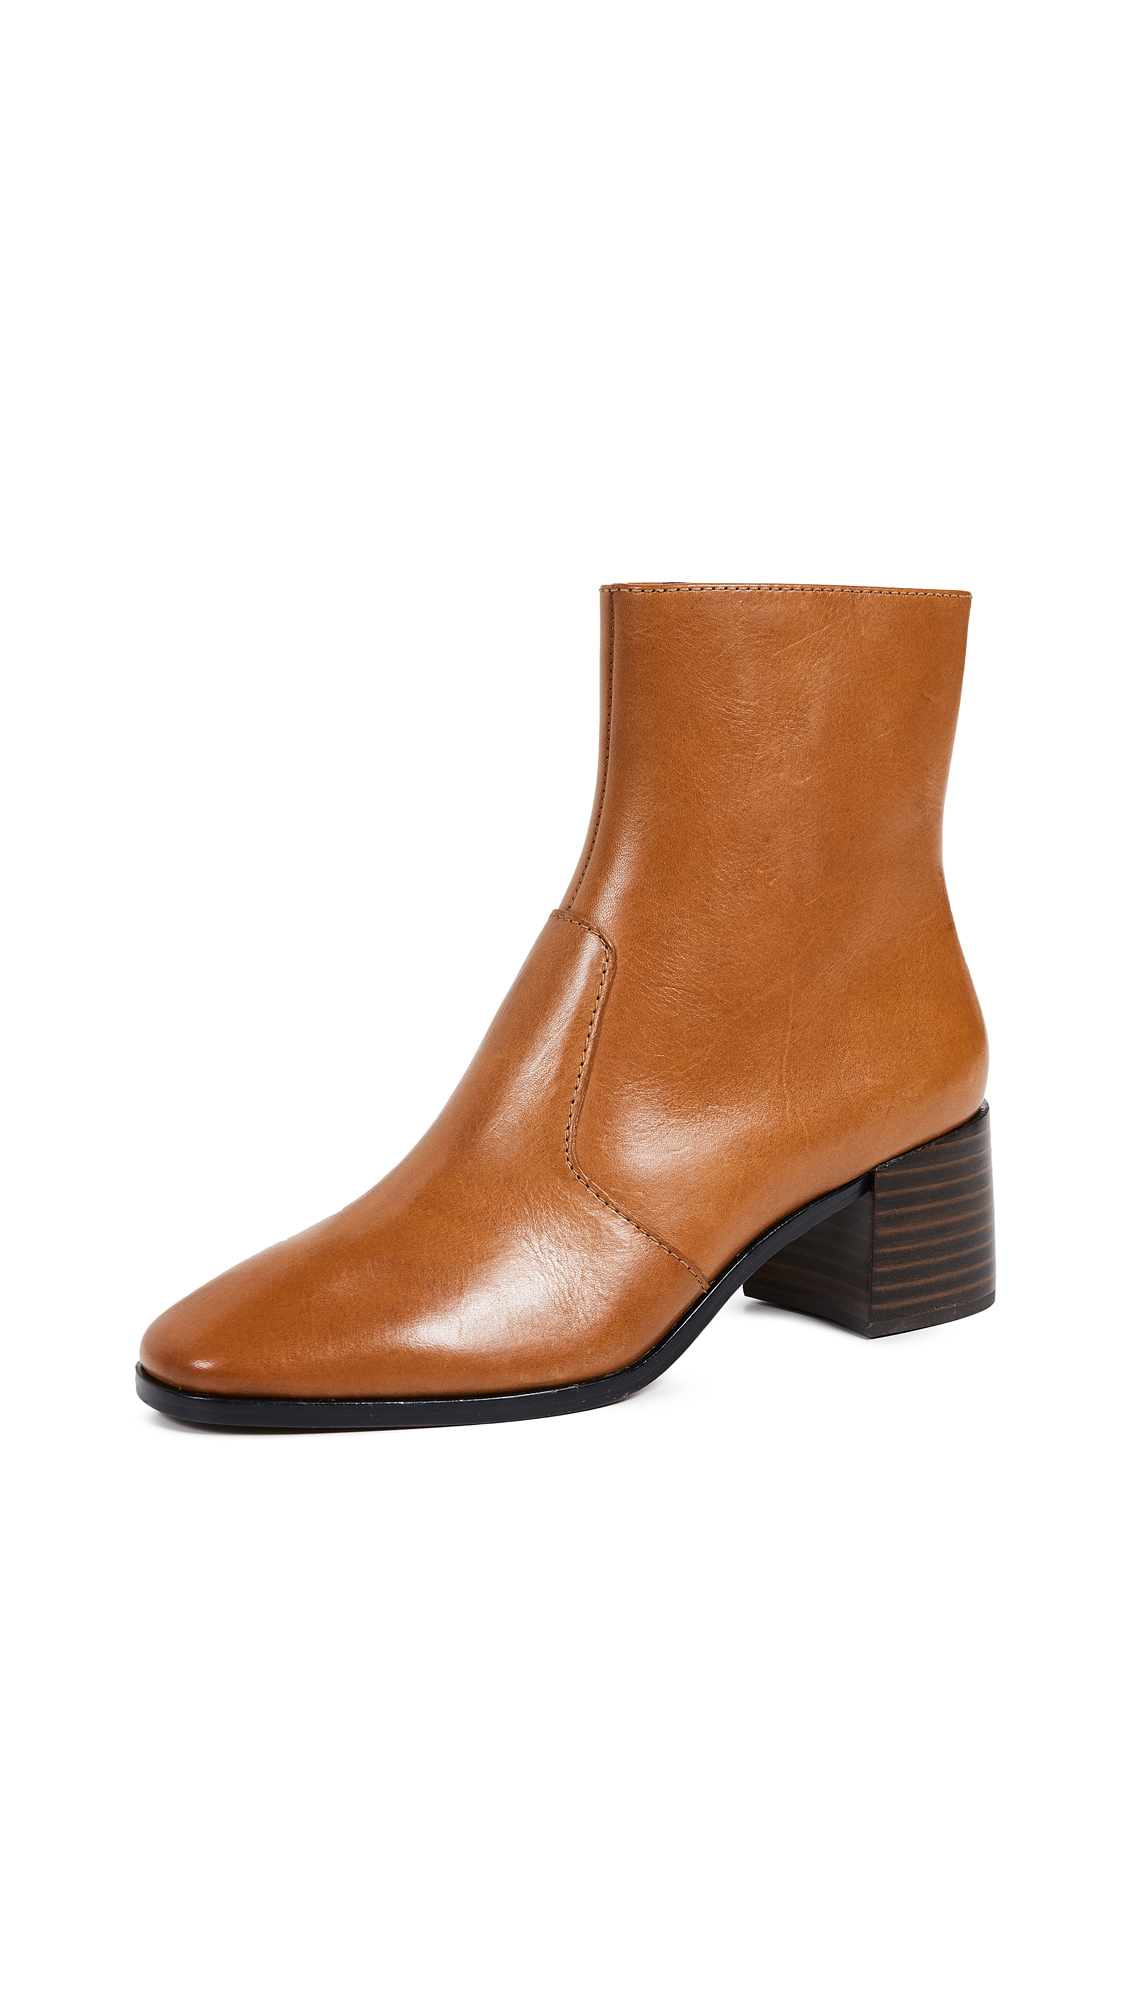 Loeffler Randall Grant Square Toe Boots - Cognac